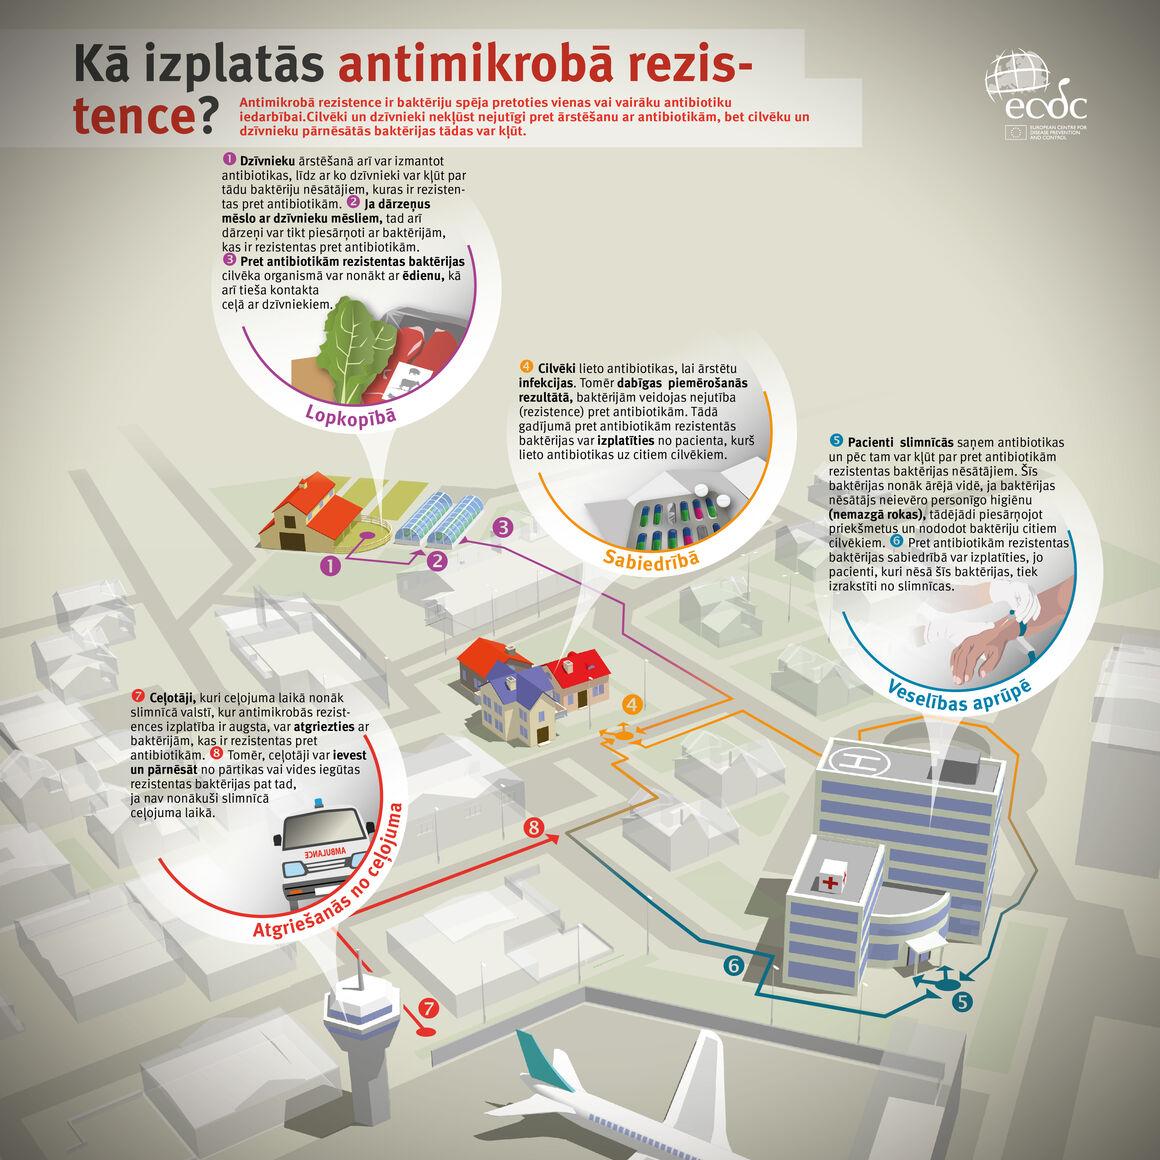 Ka izplatas antimikroba rezistence?